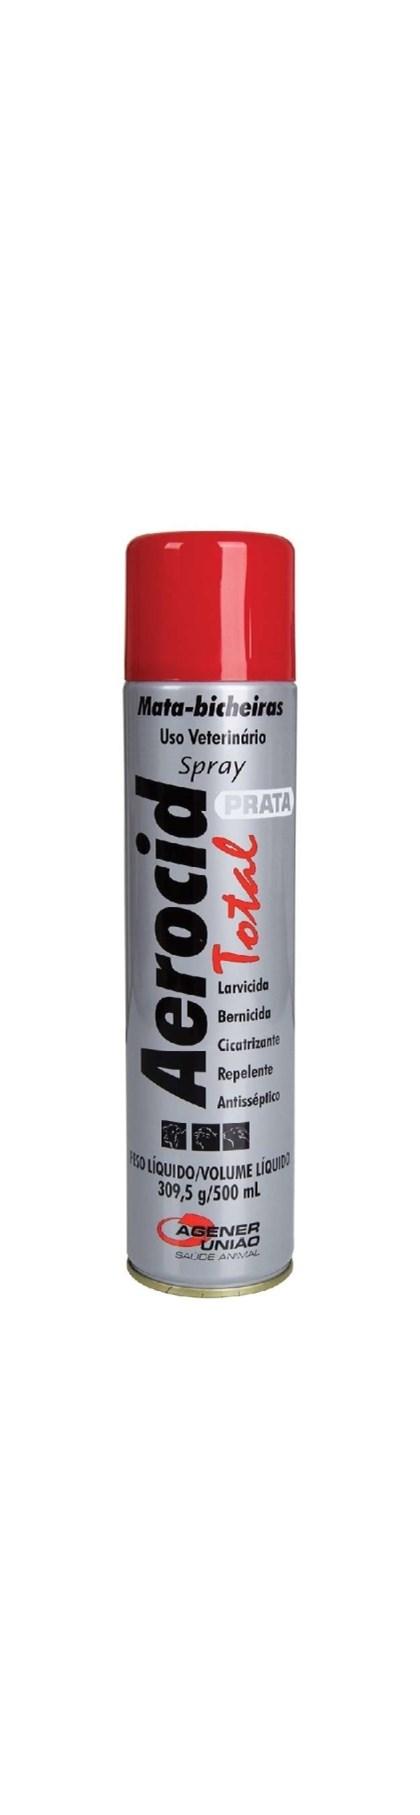 AEROCID TOTAL SPRAY 500 ML - UNIAO AGENER